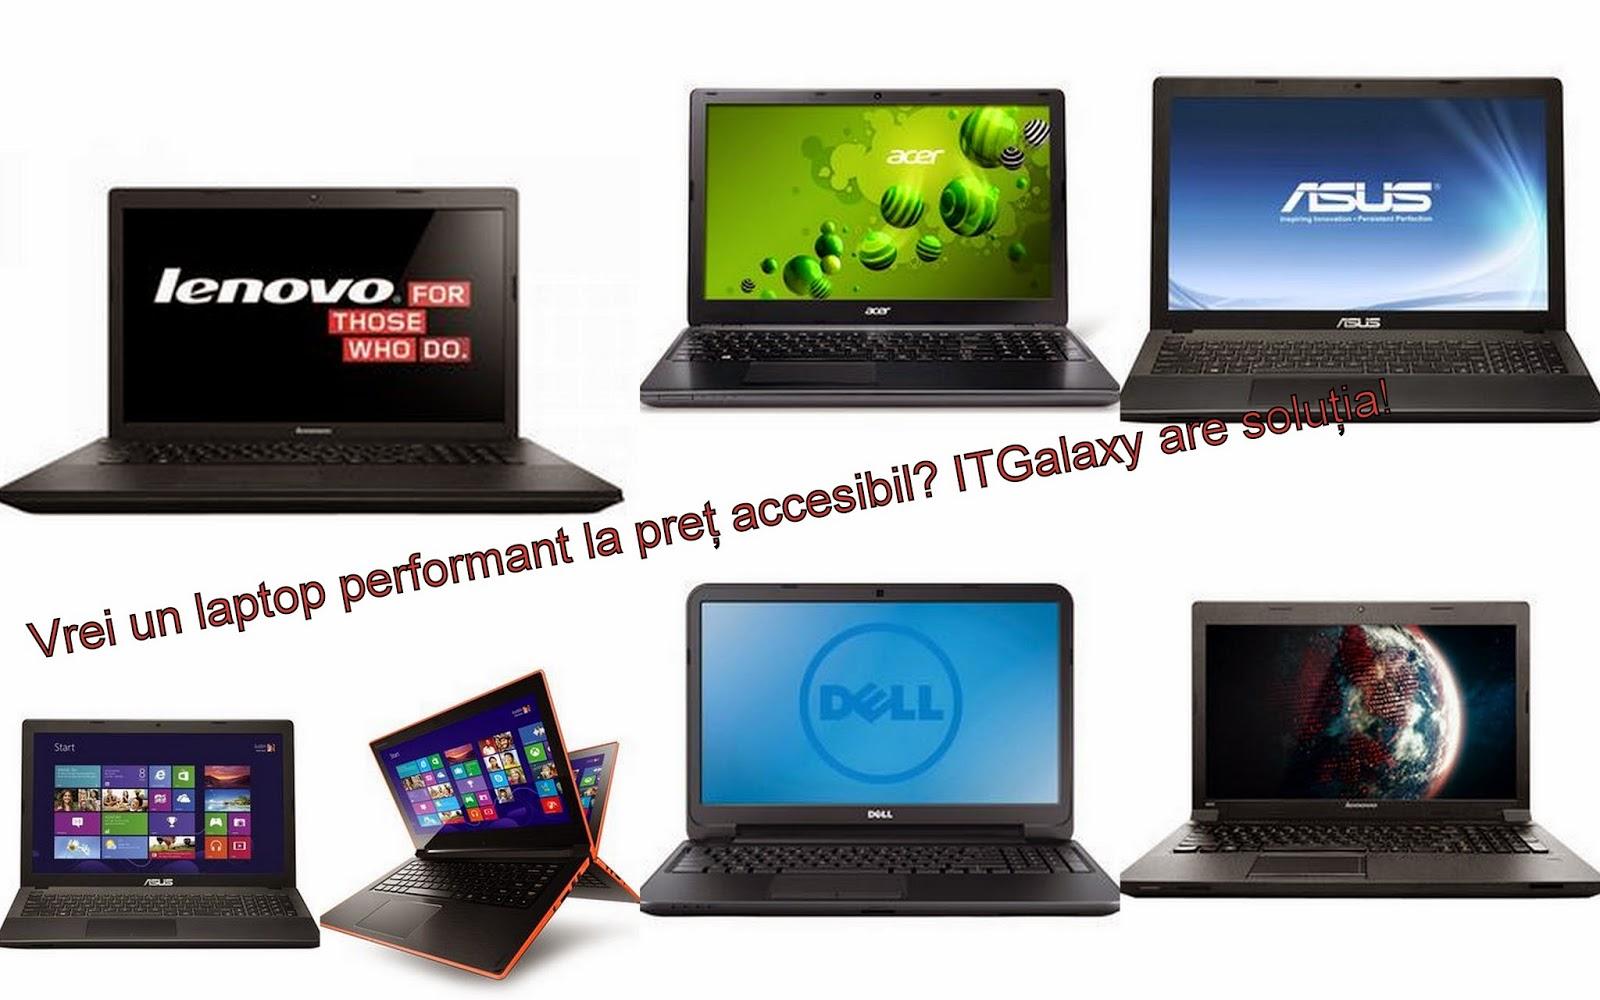 http://www.itgalaxy.ro/laptopuri/